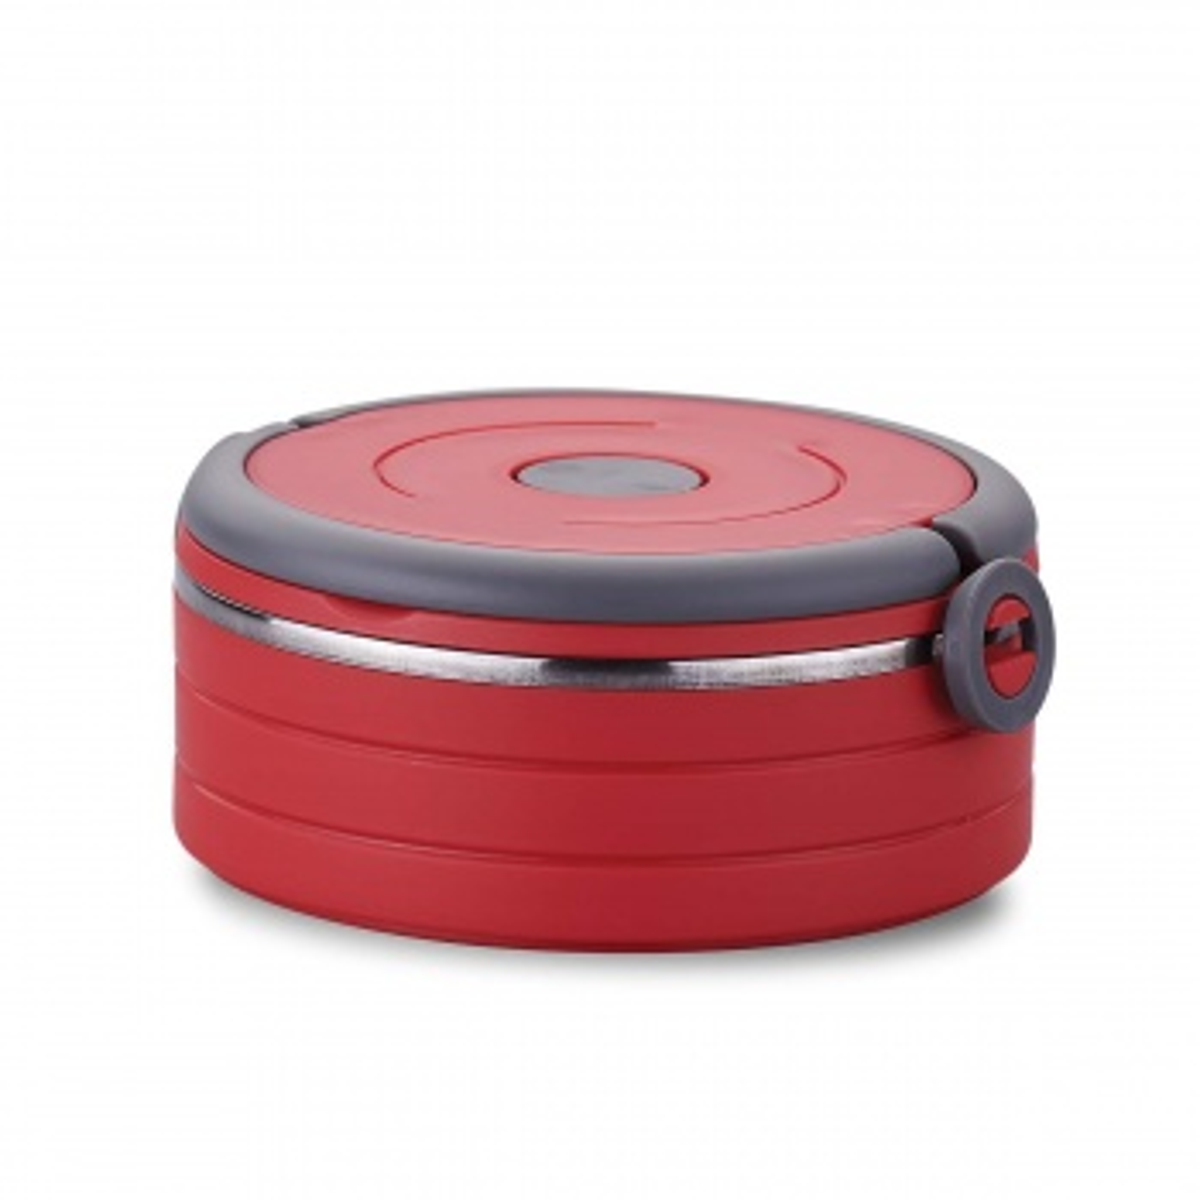 Korkmaz Essentials A5524 Warm 600 ml Sefer Tası